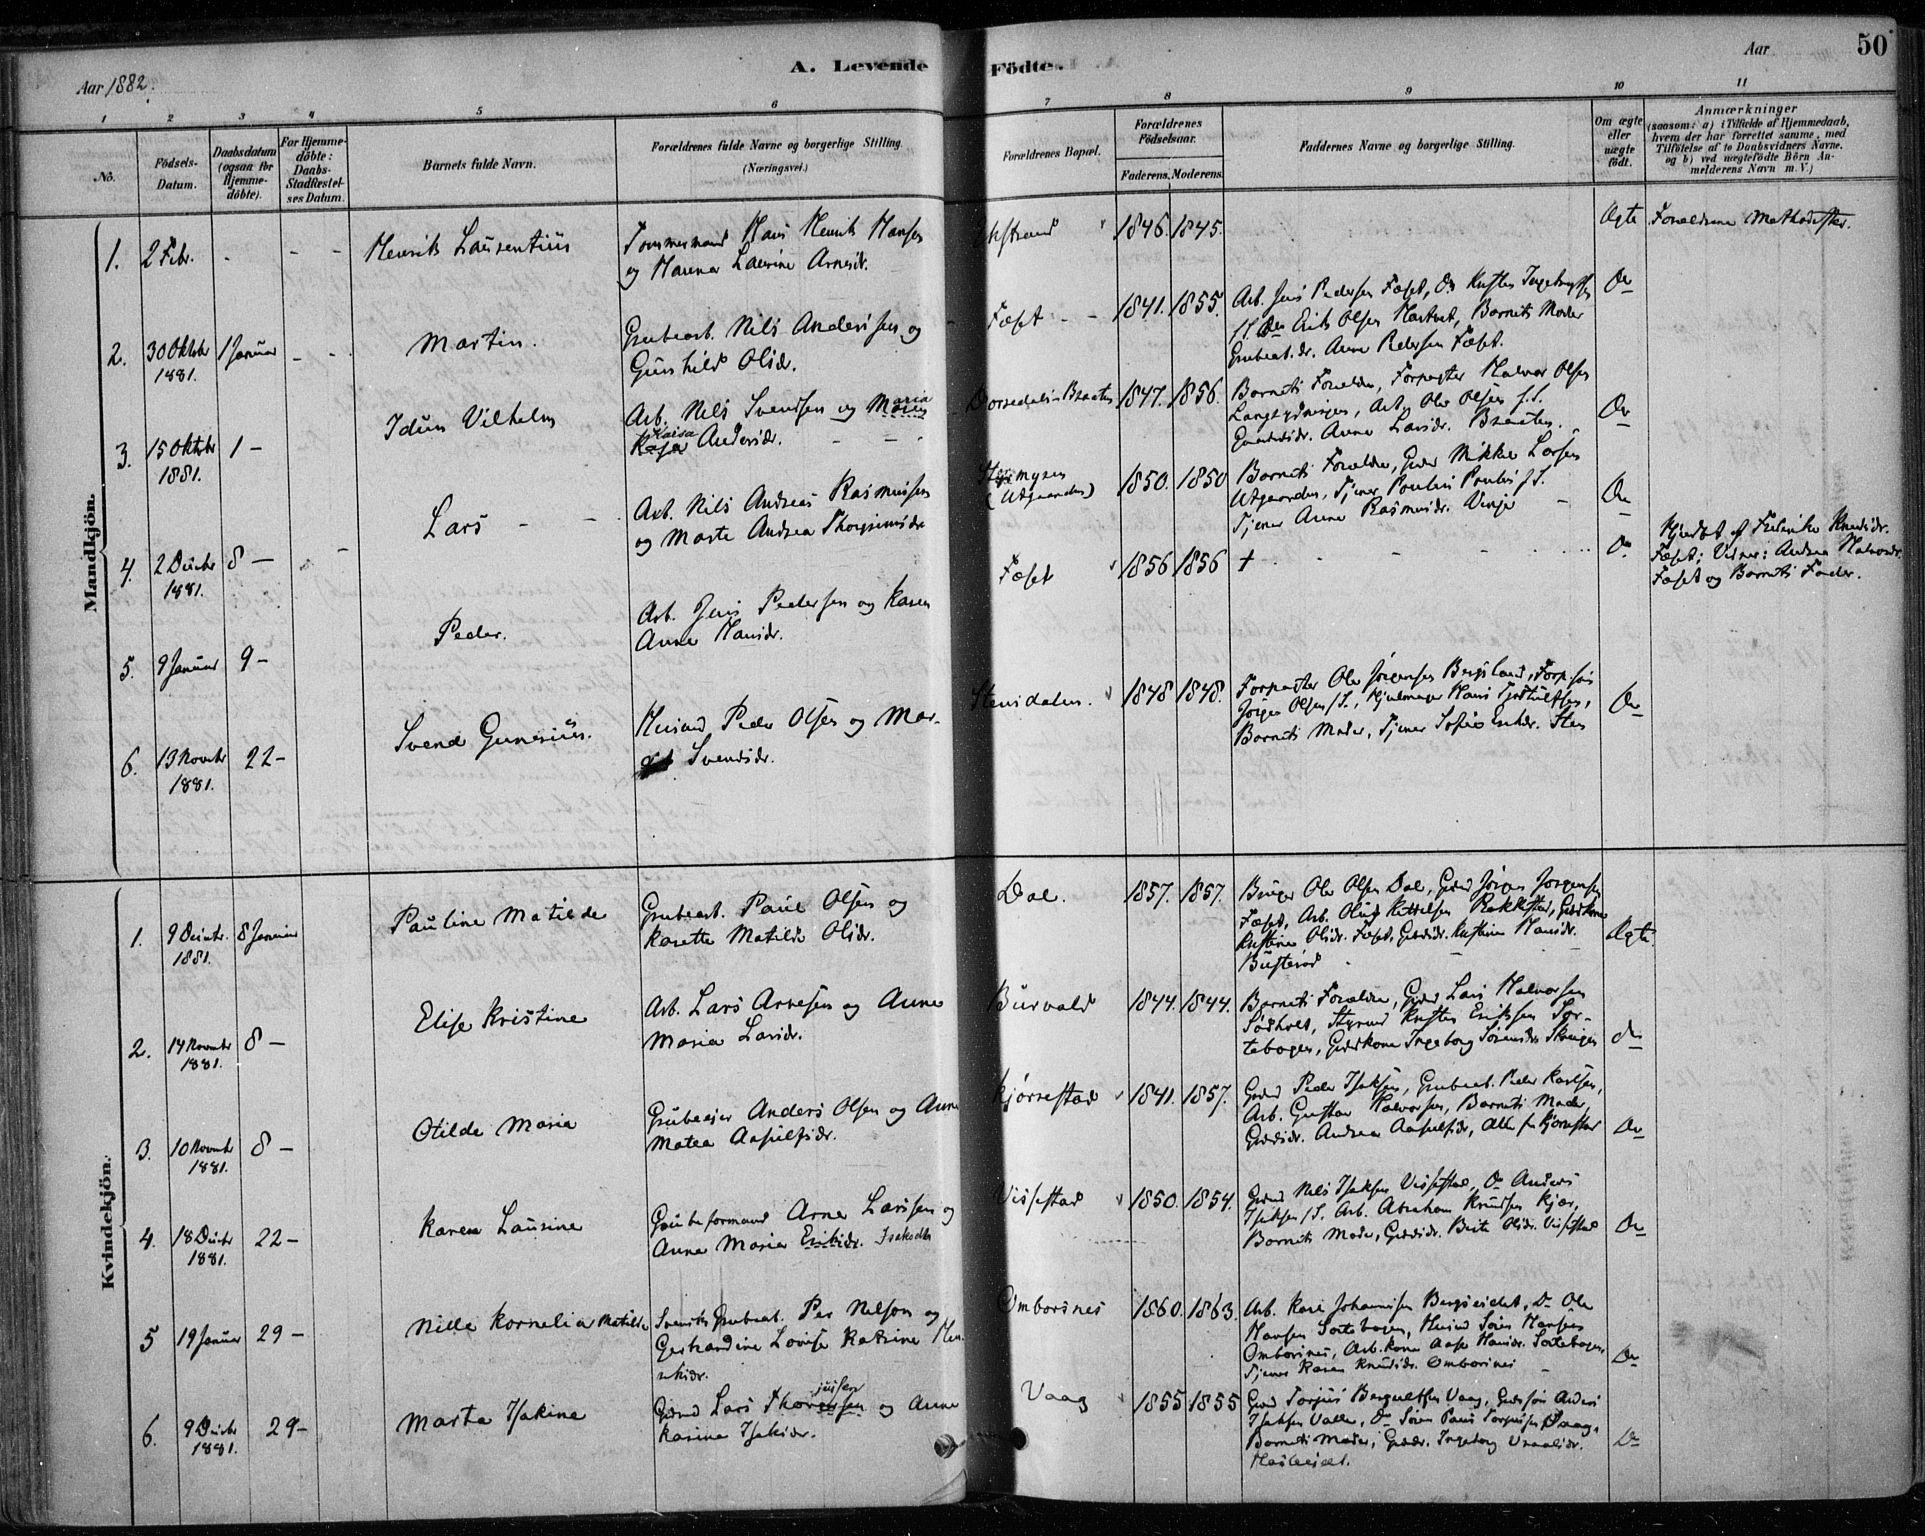 SAKO, Bamble kirkebøker, F/Fa/L0007: Ministerialbok nr. I 7, 1878-1888, s. 50